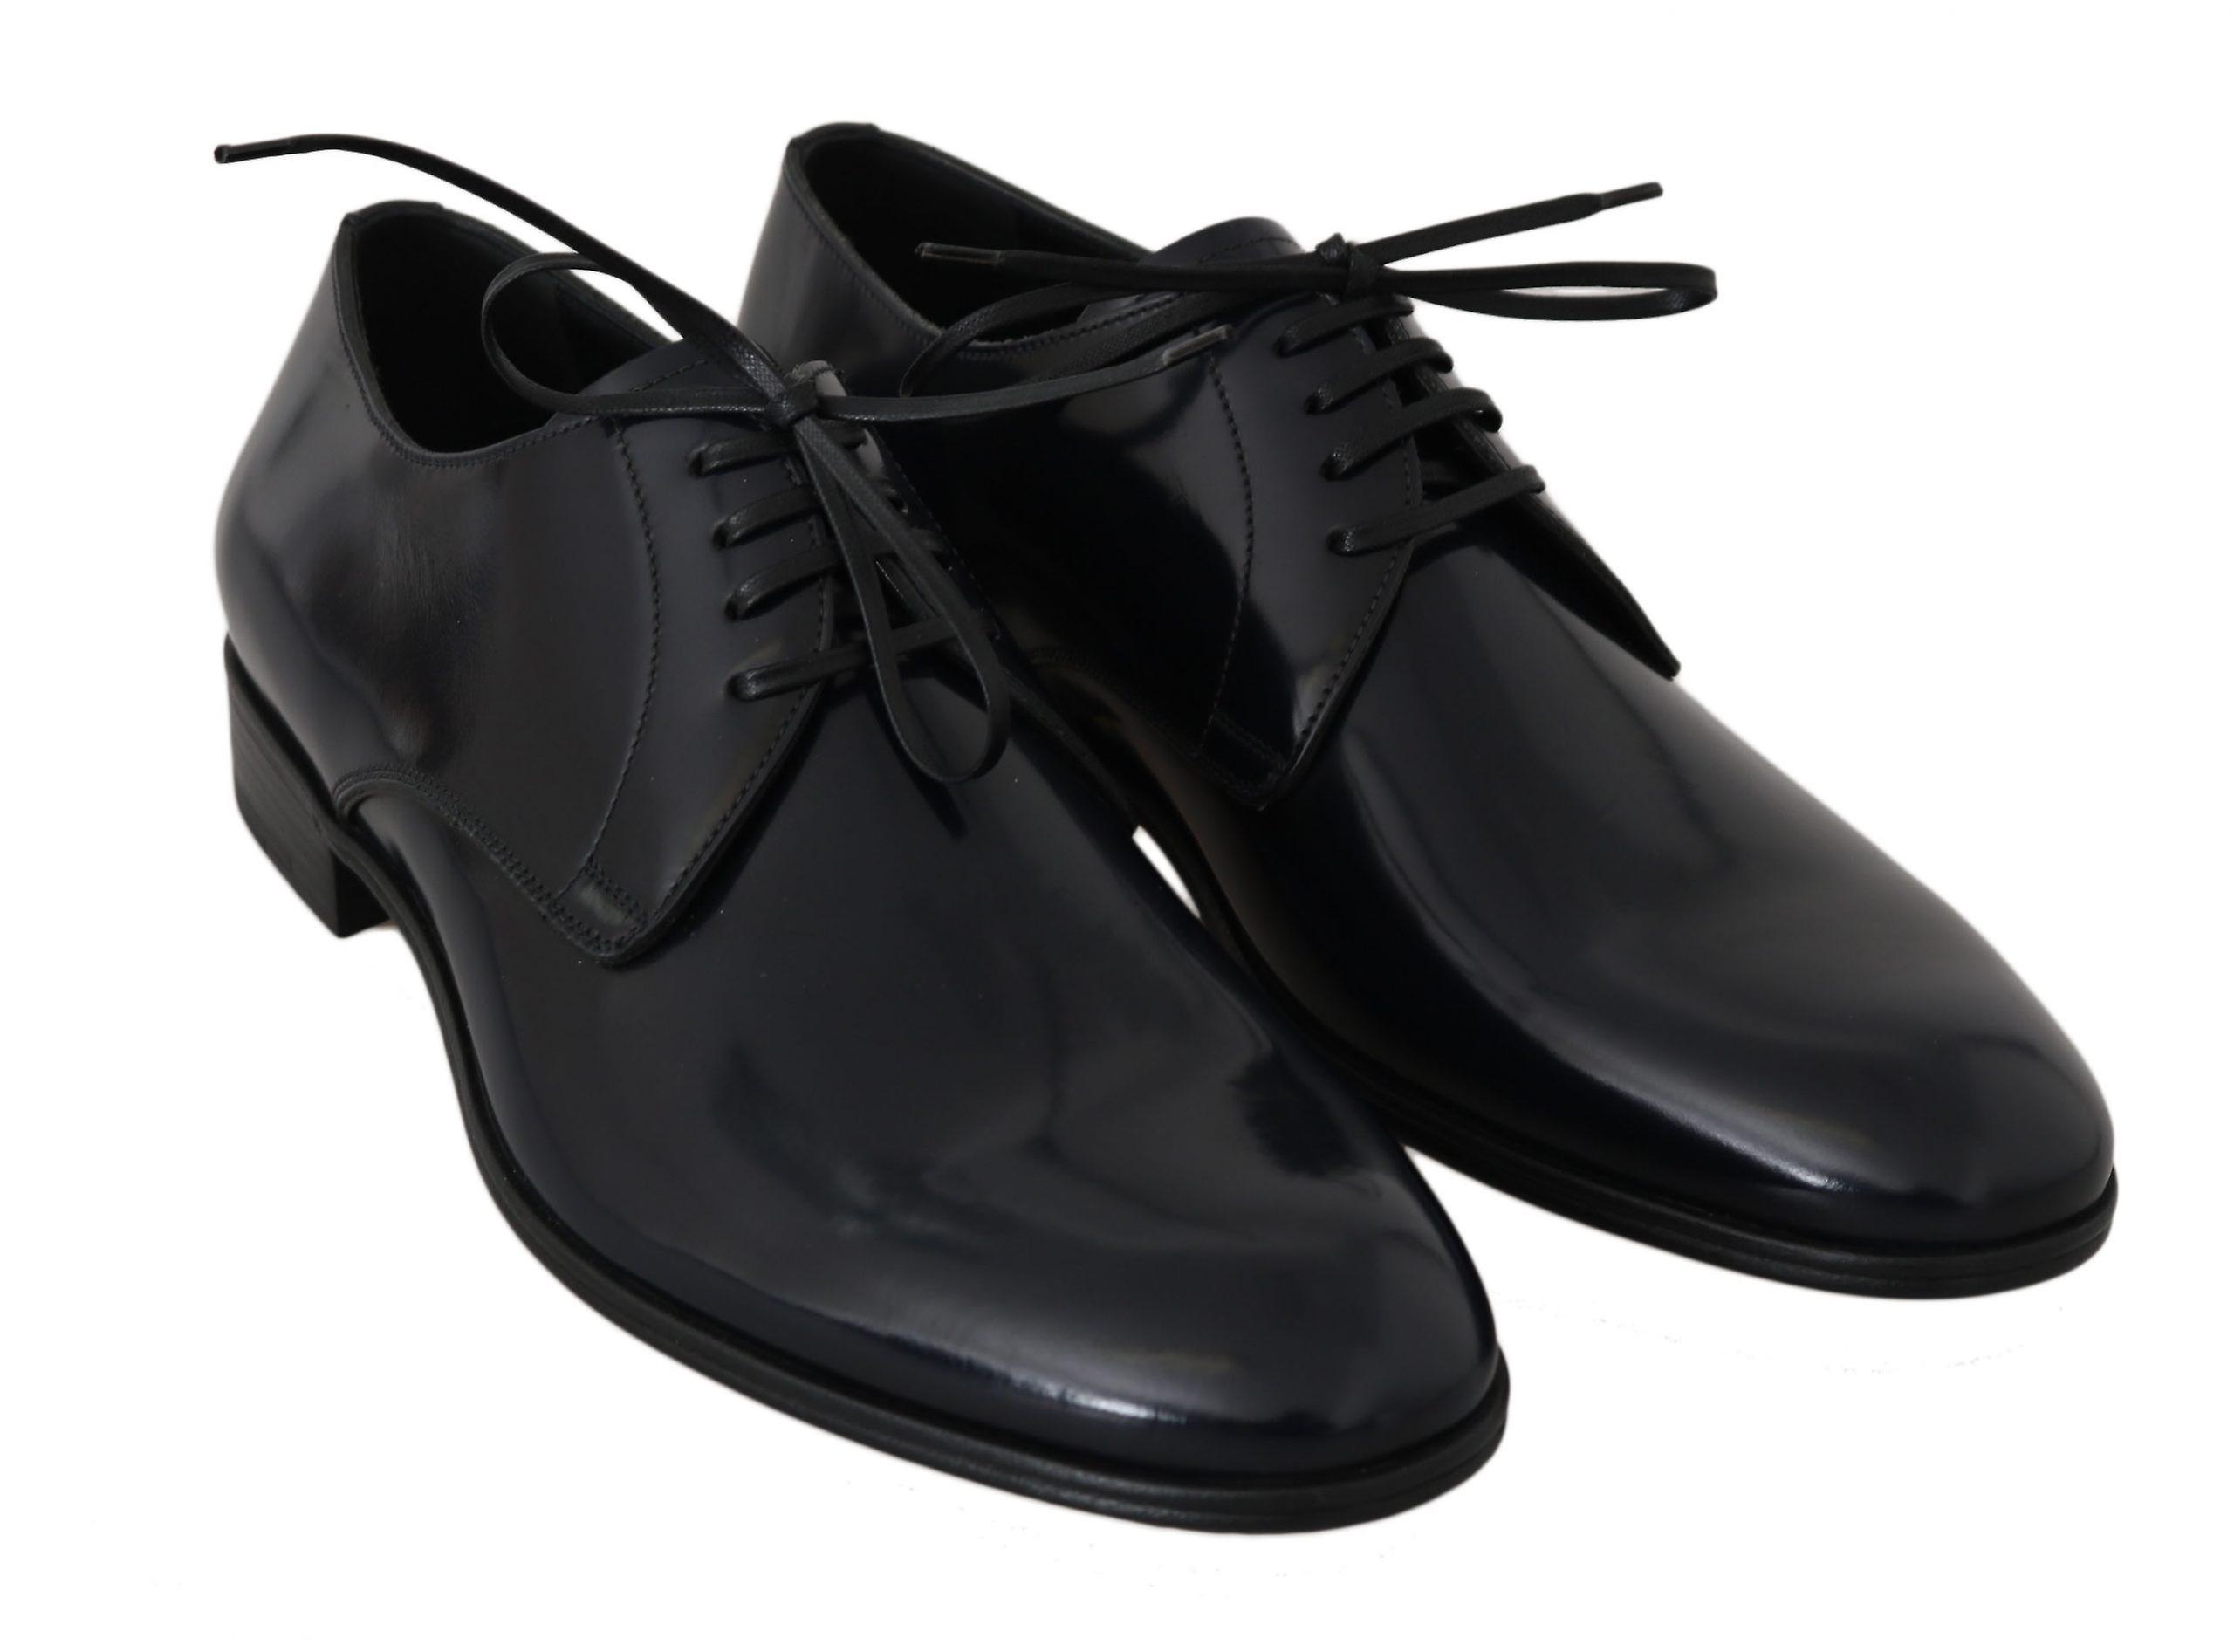 Dolce & Gabbana Blue Leather Dress Derby Formal Mens  Shoes MV2336-40